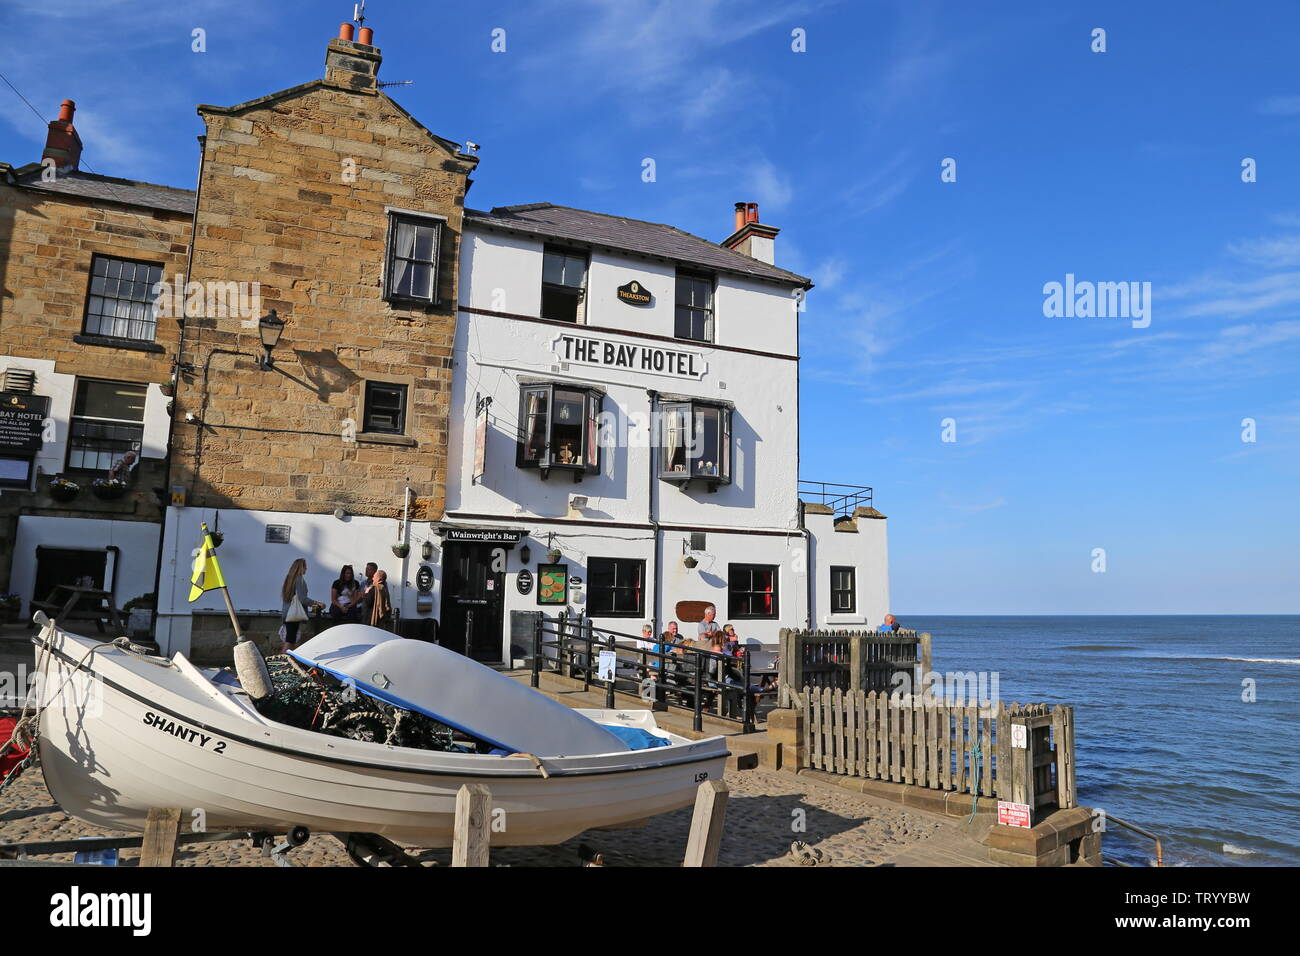 Bay Hotel, The Dock, Robin Hood's Bay, Borough of Scarborough, North Yorkshire, England, Great Britain, United Kingdom, UK, Europe Stock Photo